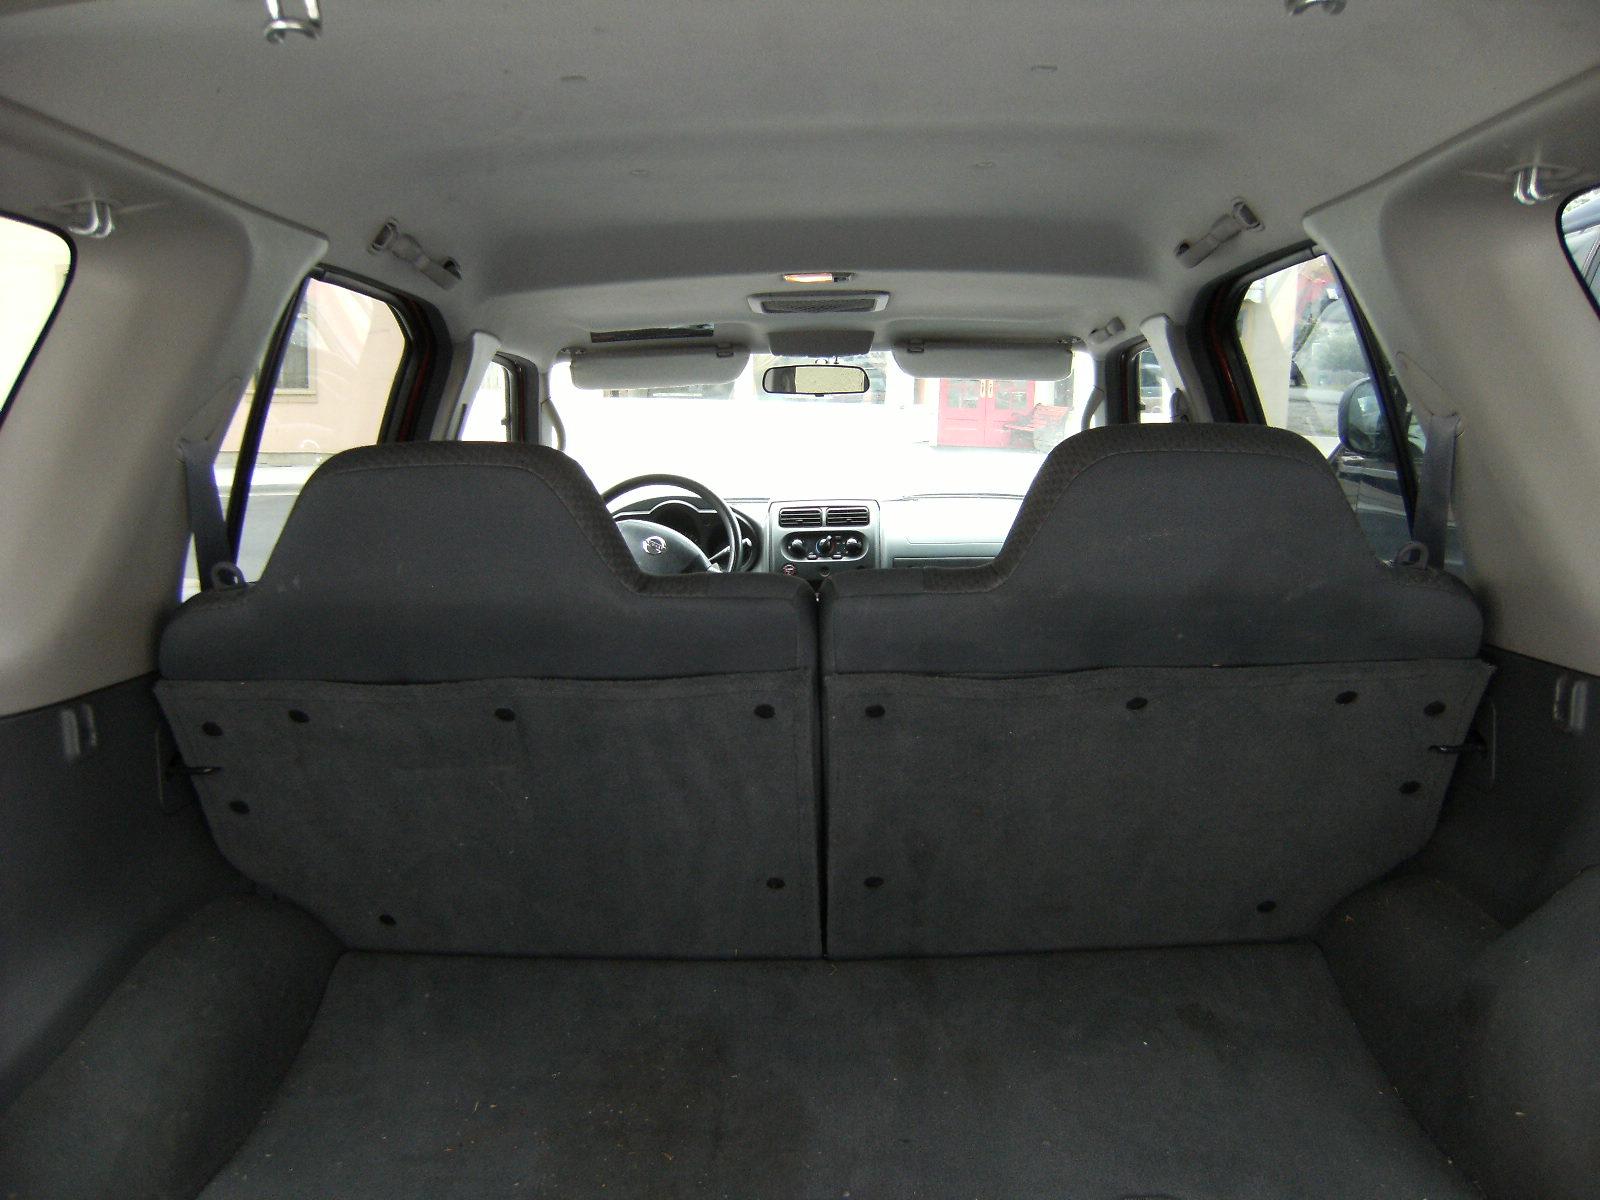 2003 Nissan Xterra Trailer Hitch